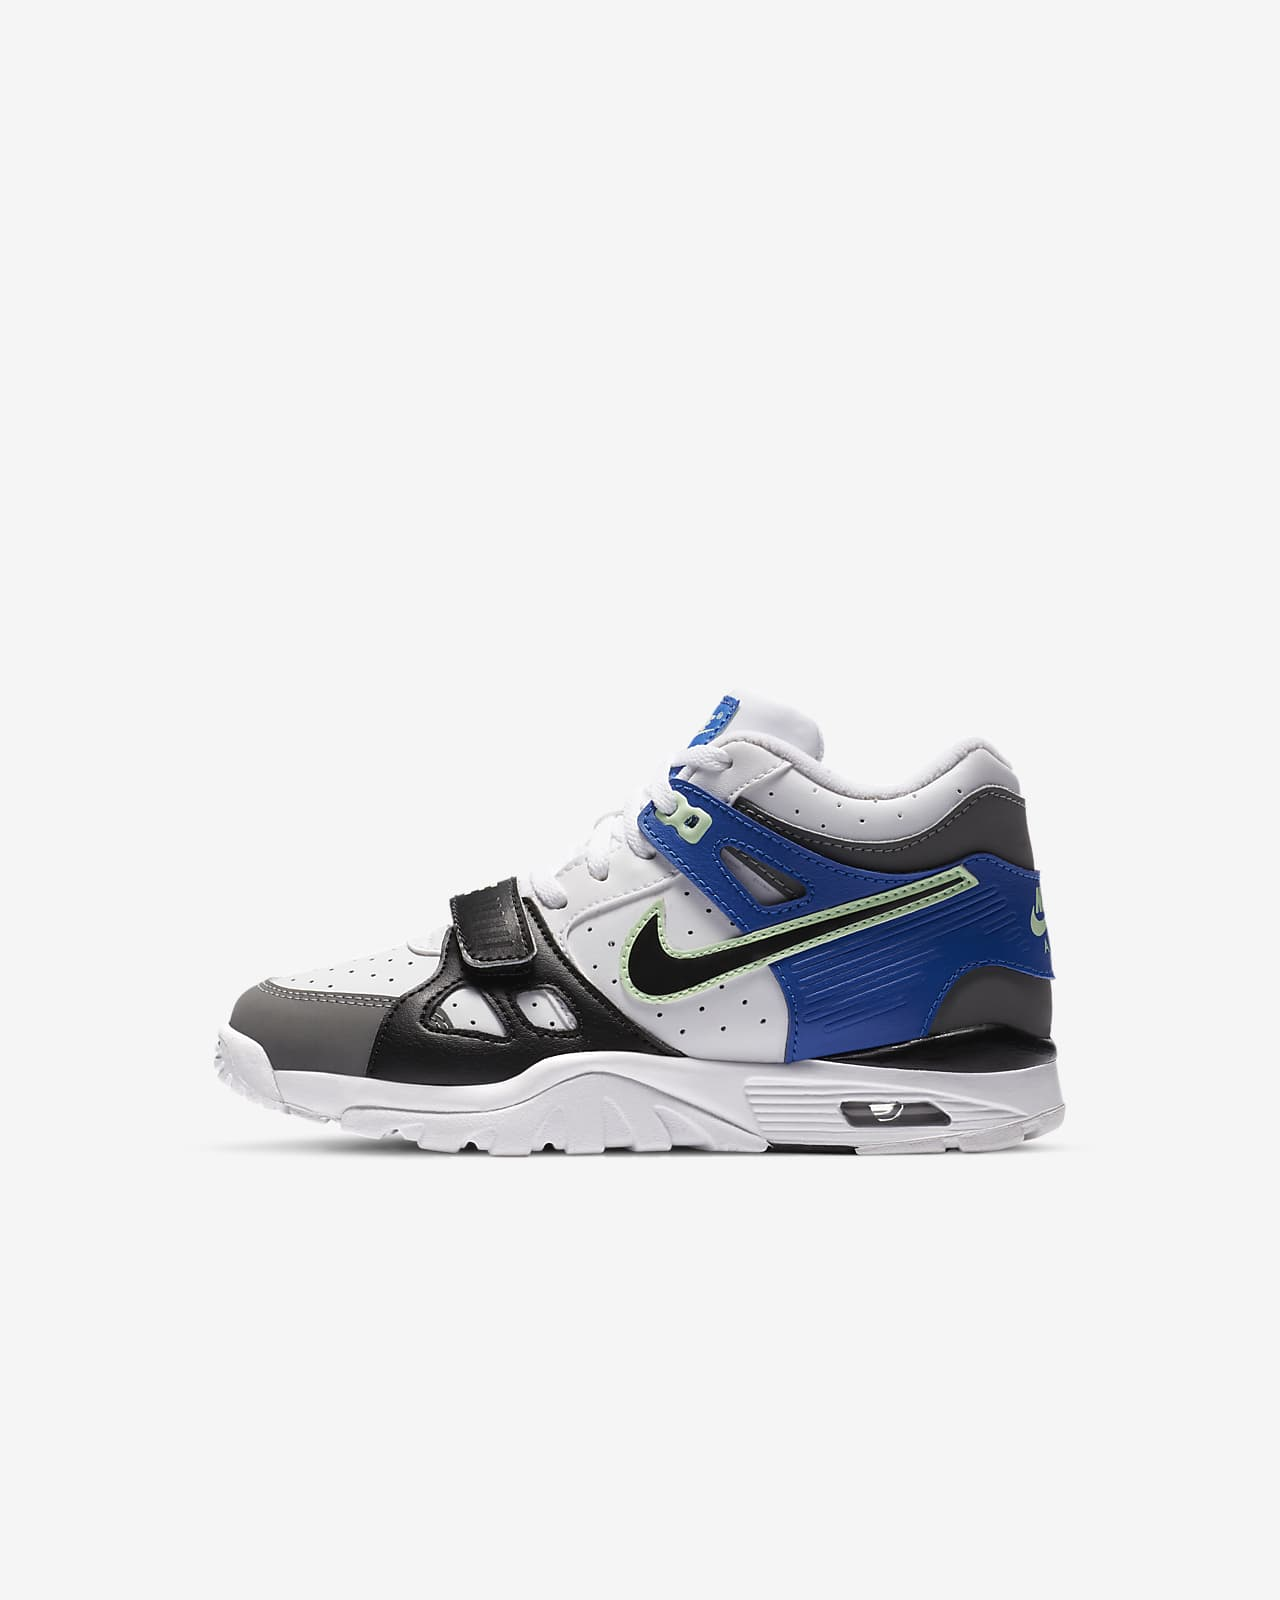 Nike Air Trainer 3 (PS) 幼童运动童鞋